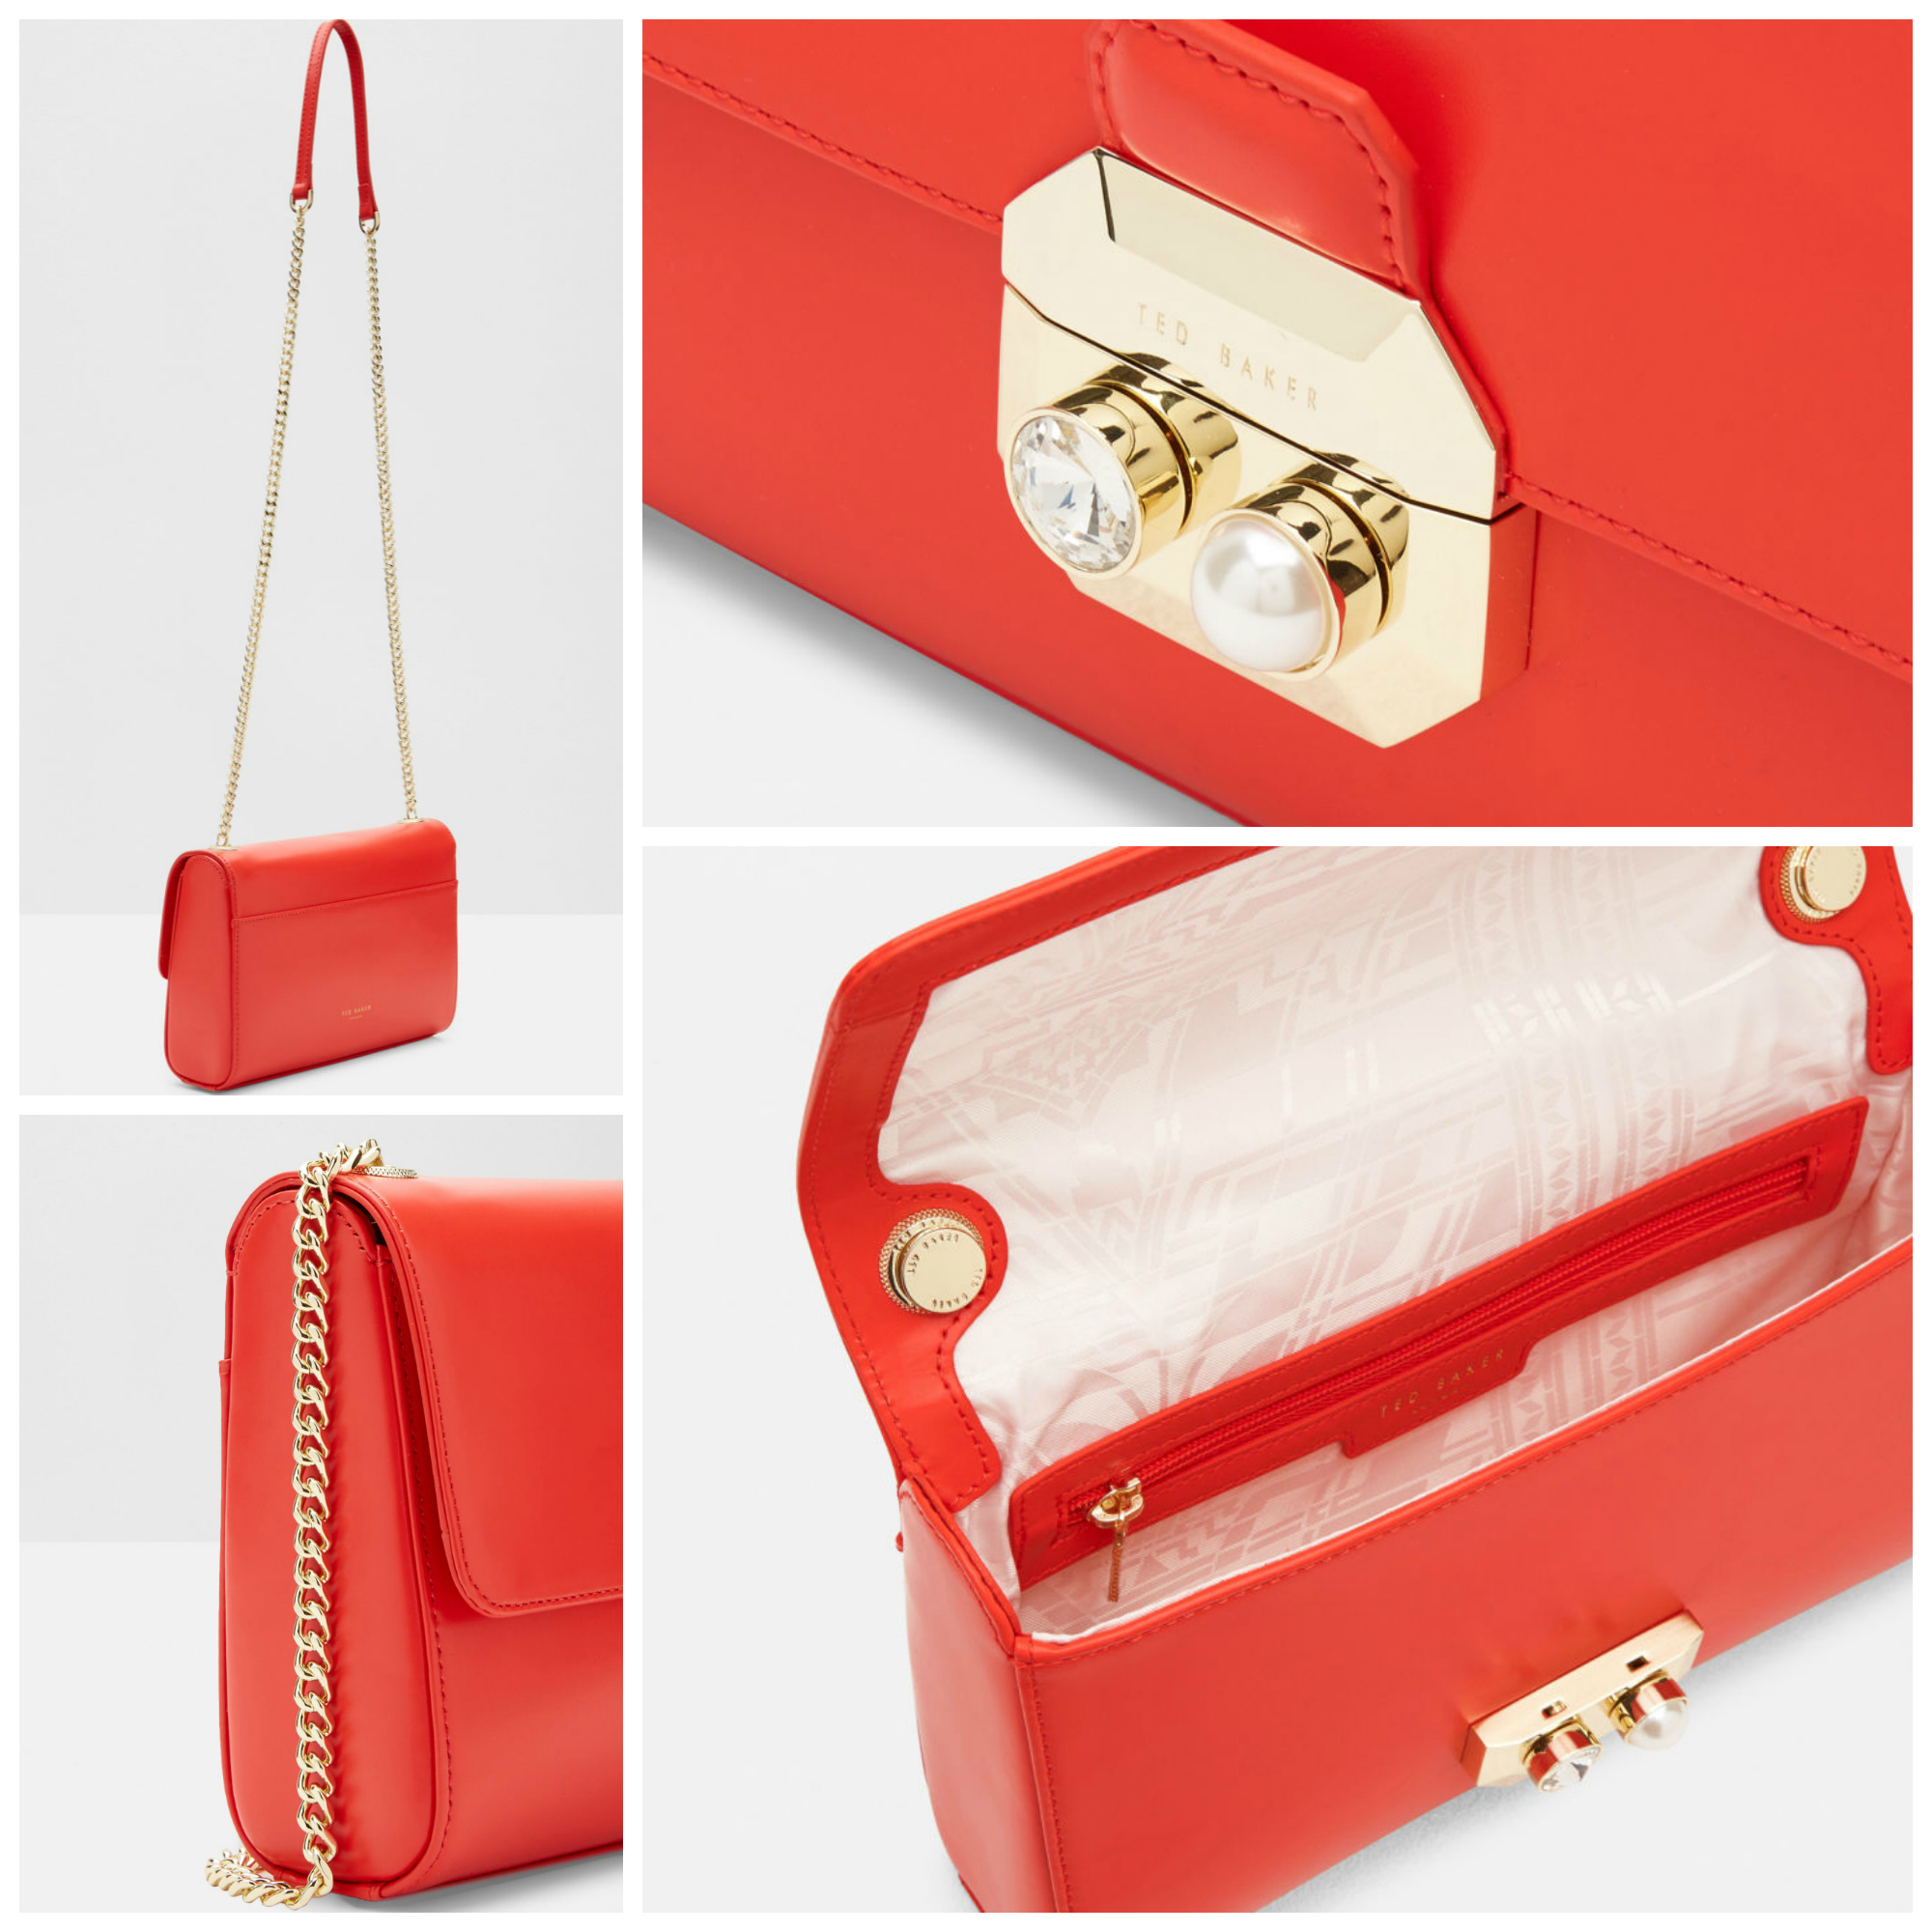 VINAA Handbag $225